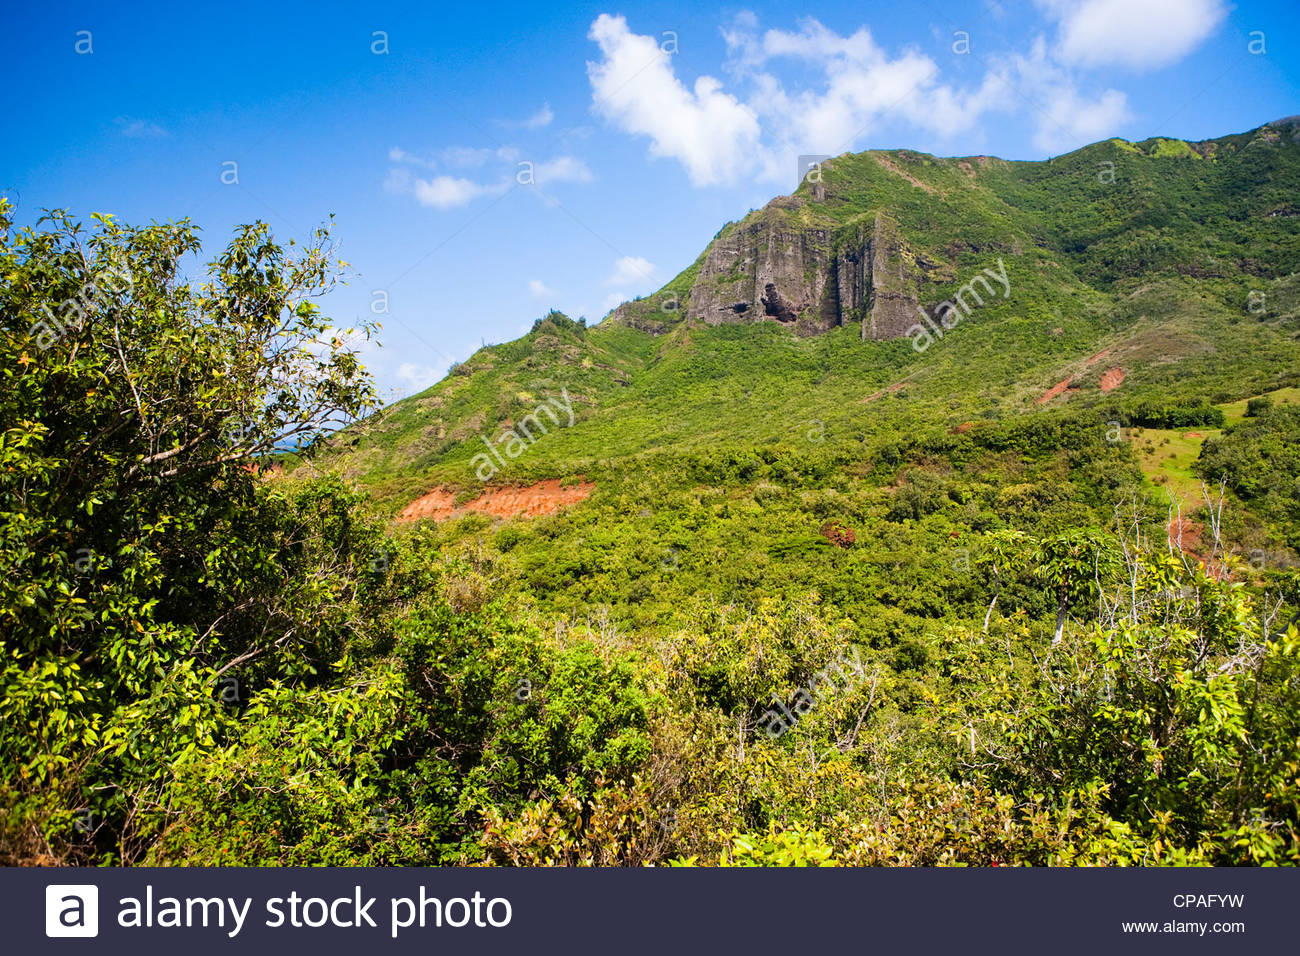 Kauai Hawaii USA The Haupu mountain range is in the background 1300x956